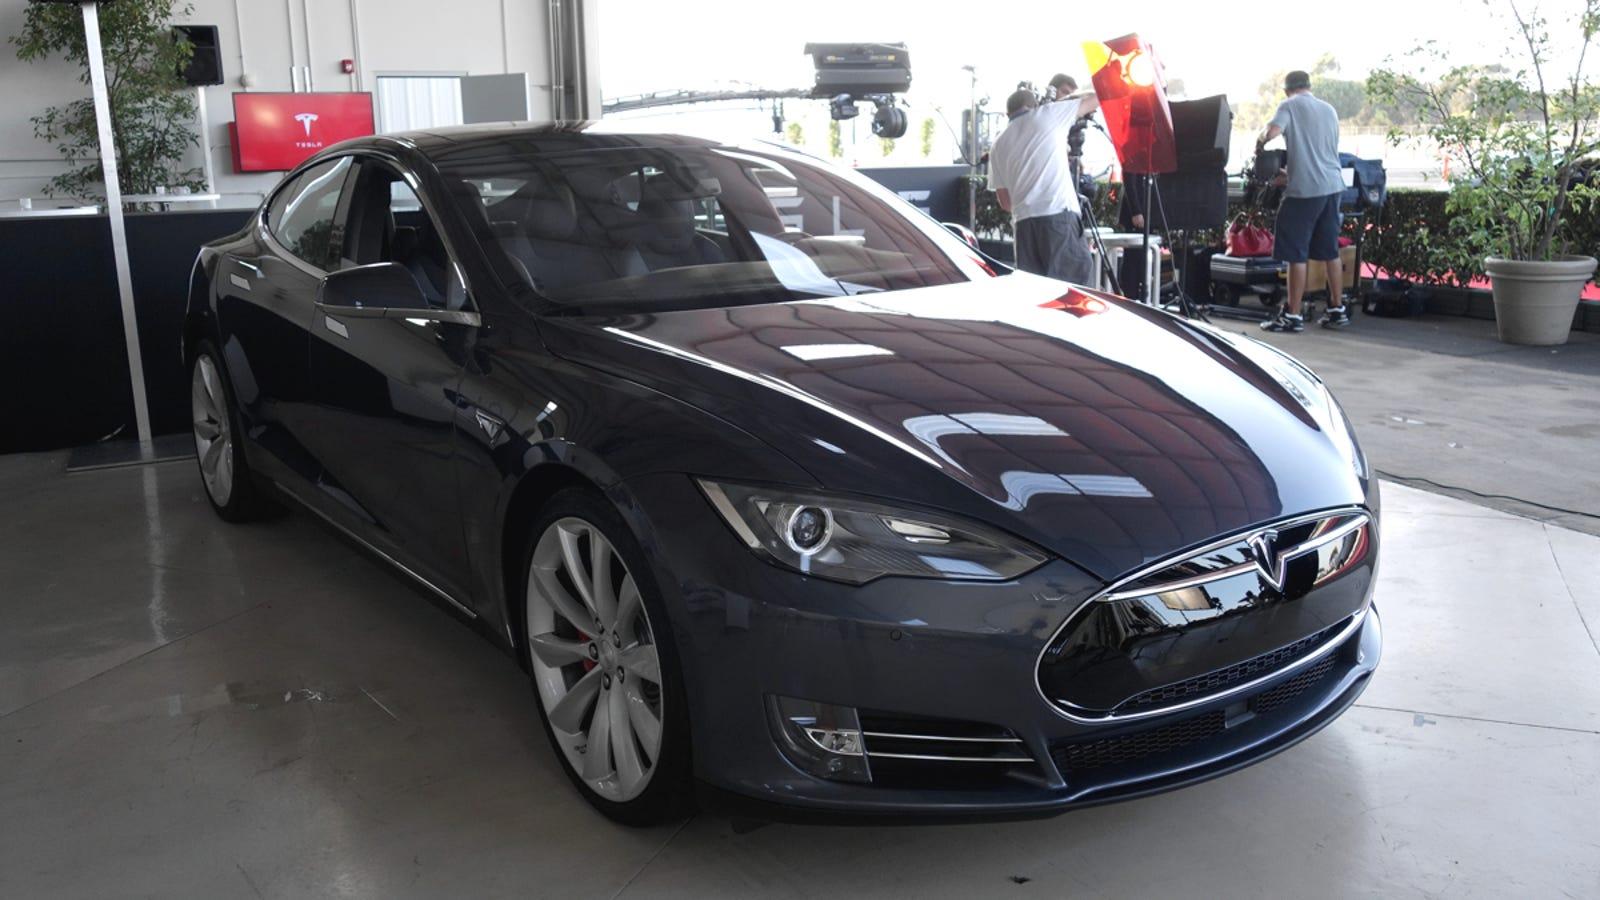 Tesla Model S Auto Pilot Does Lane Changes For You